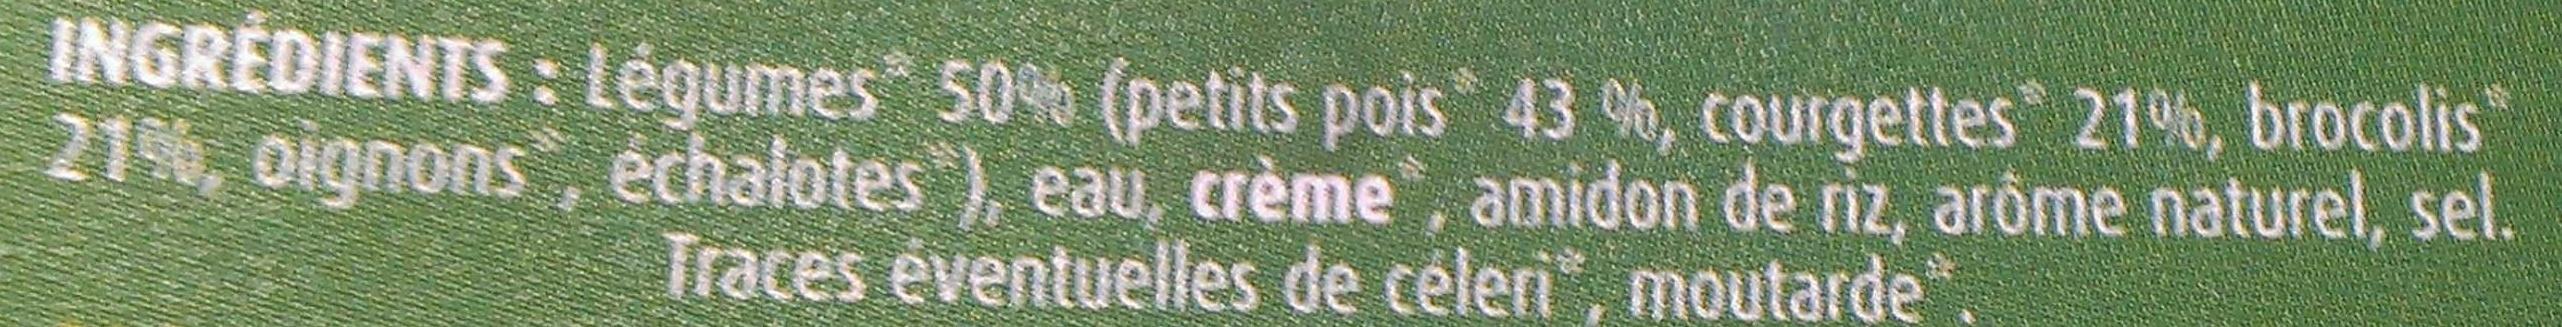 Soupe petit pois brocoli et courgettes bio - Ingrediënten - fr